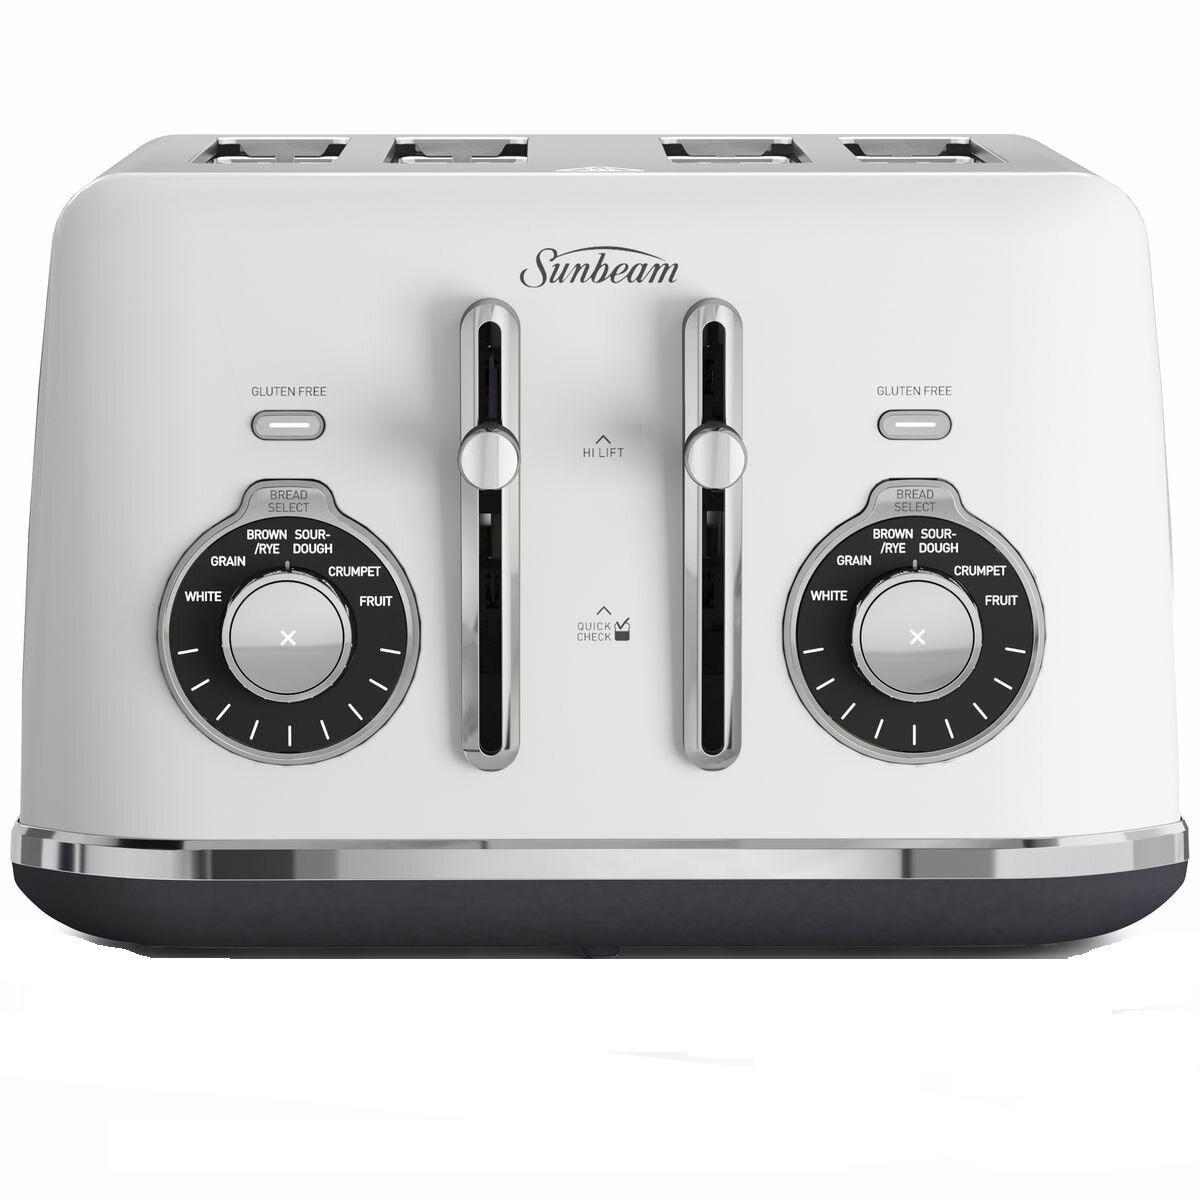 Sunbeam TA2840 Toaster